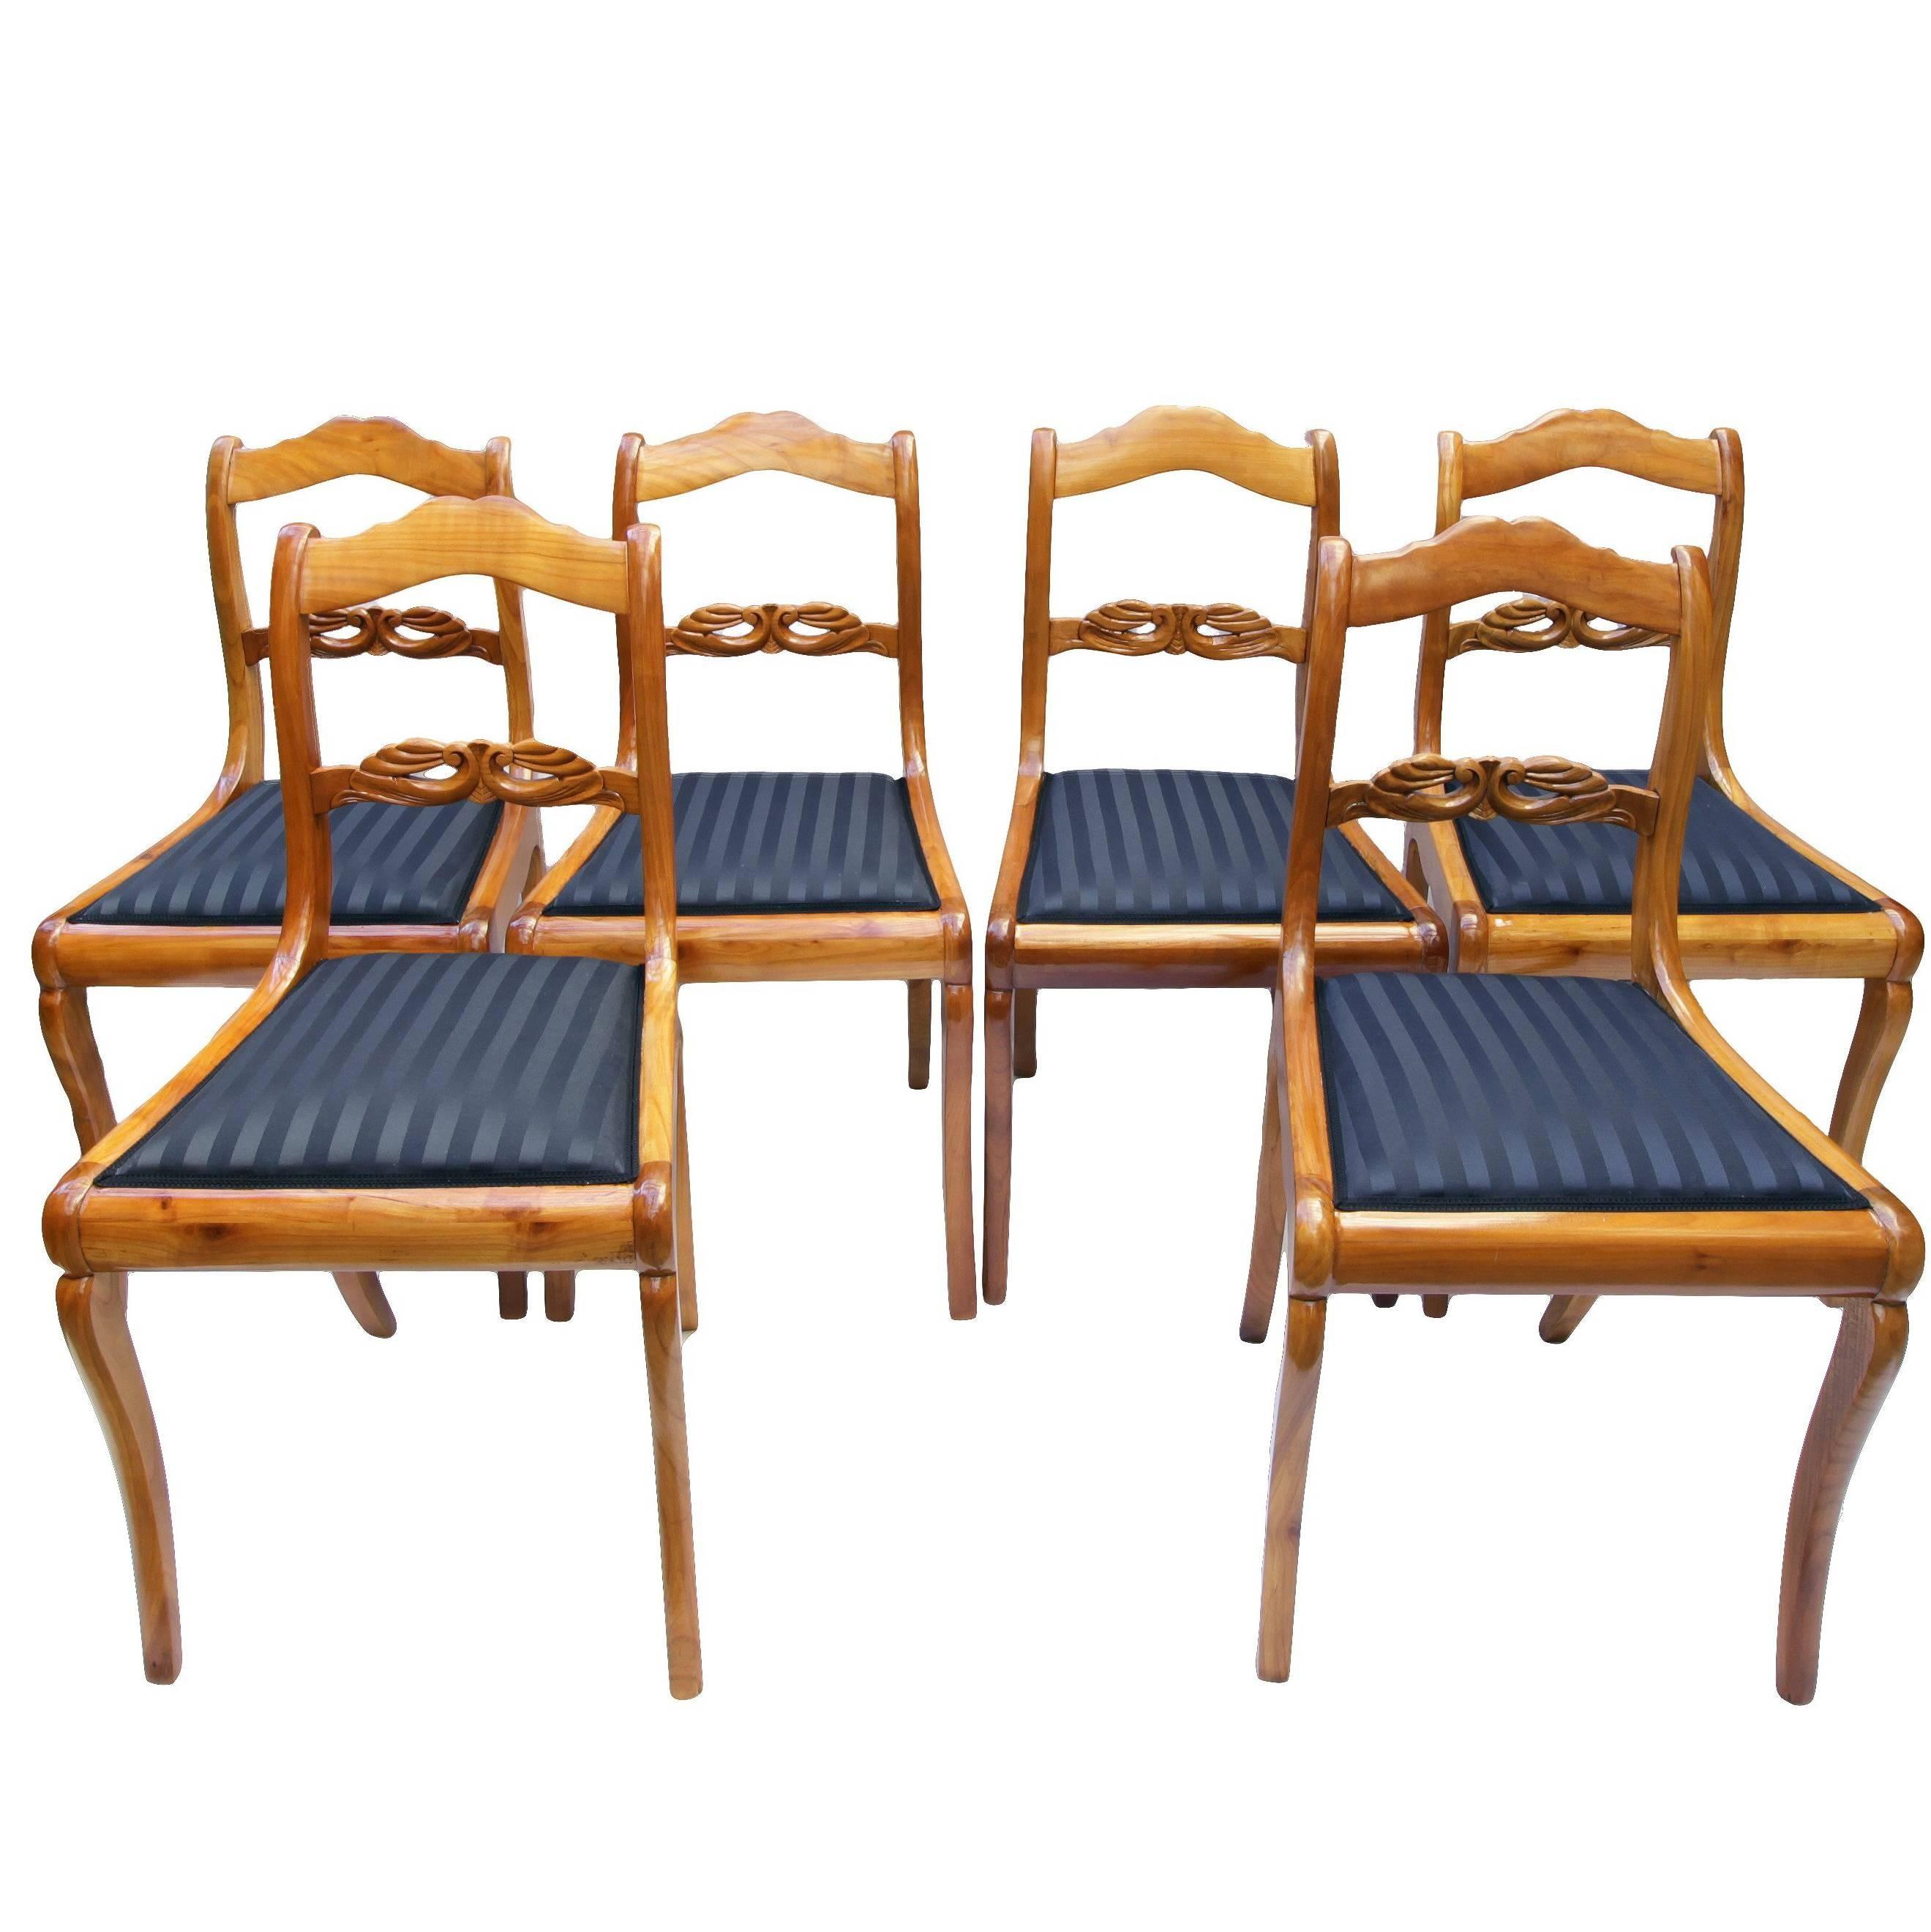 19th Century, Set of Six Cherry Biedermeier Chairs, Germany